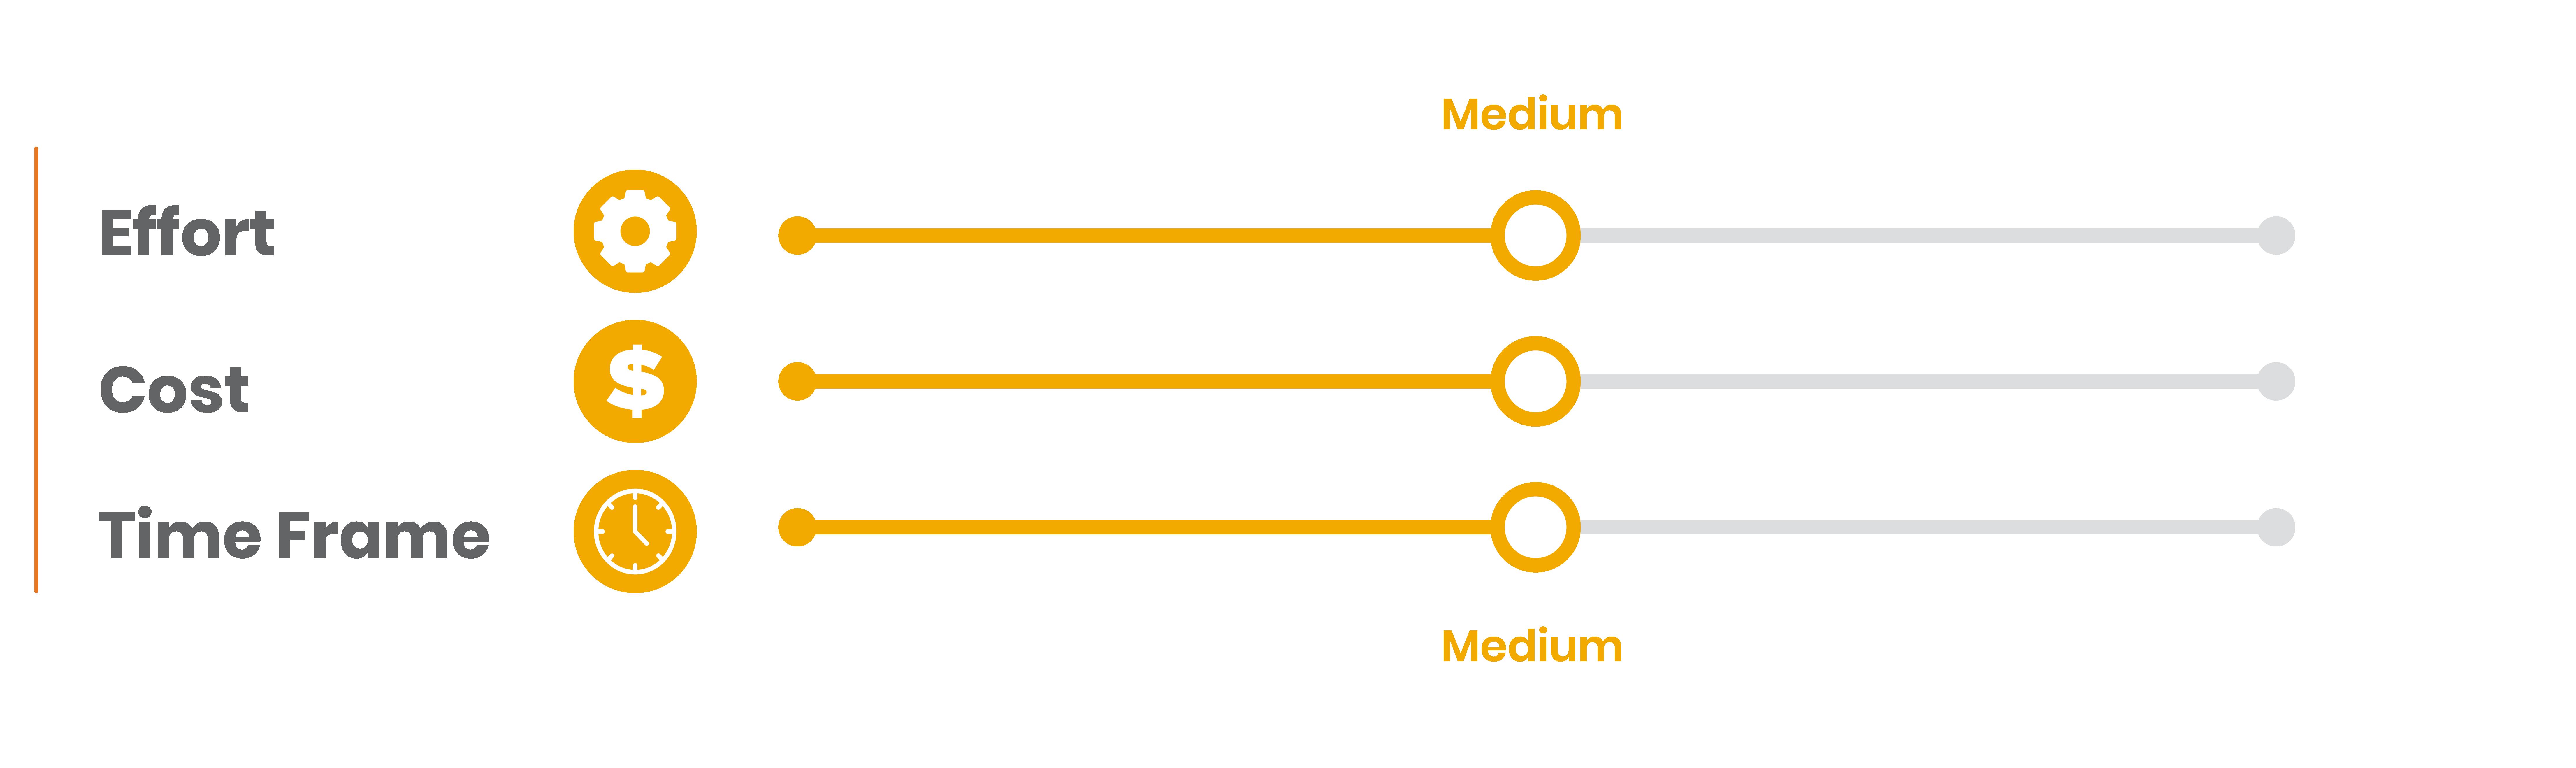 4.Bar side graphic with three metrics effort medium risk, cost medium risk, time frame medium risk